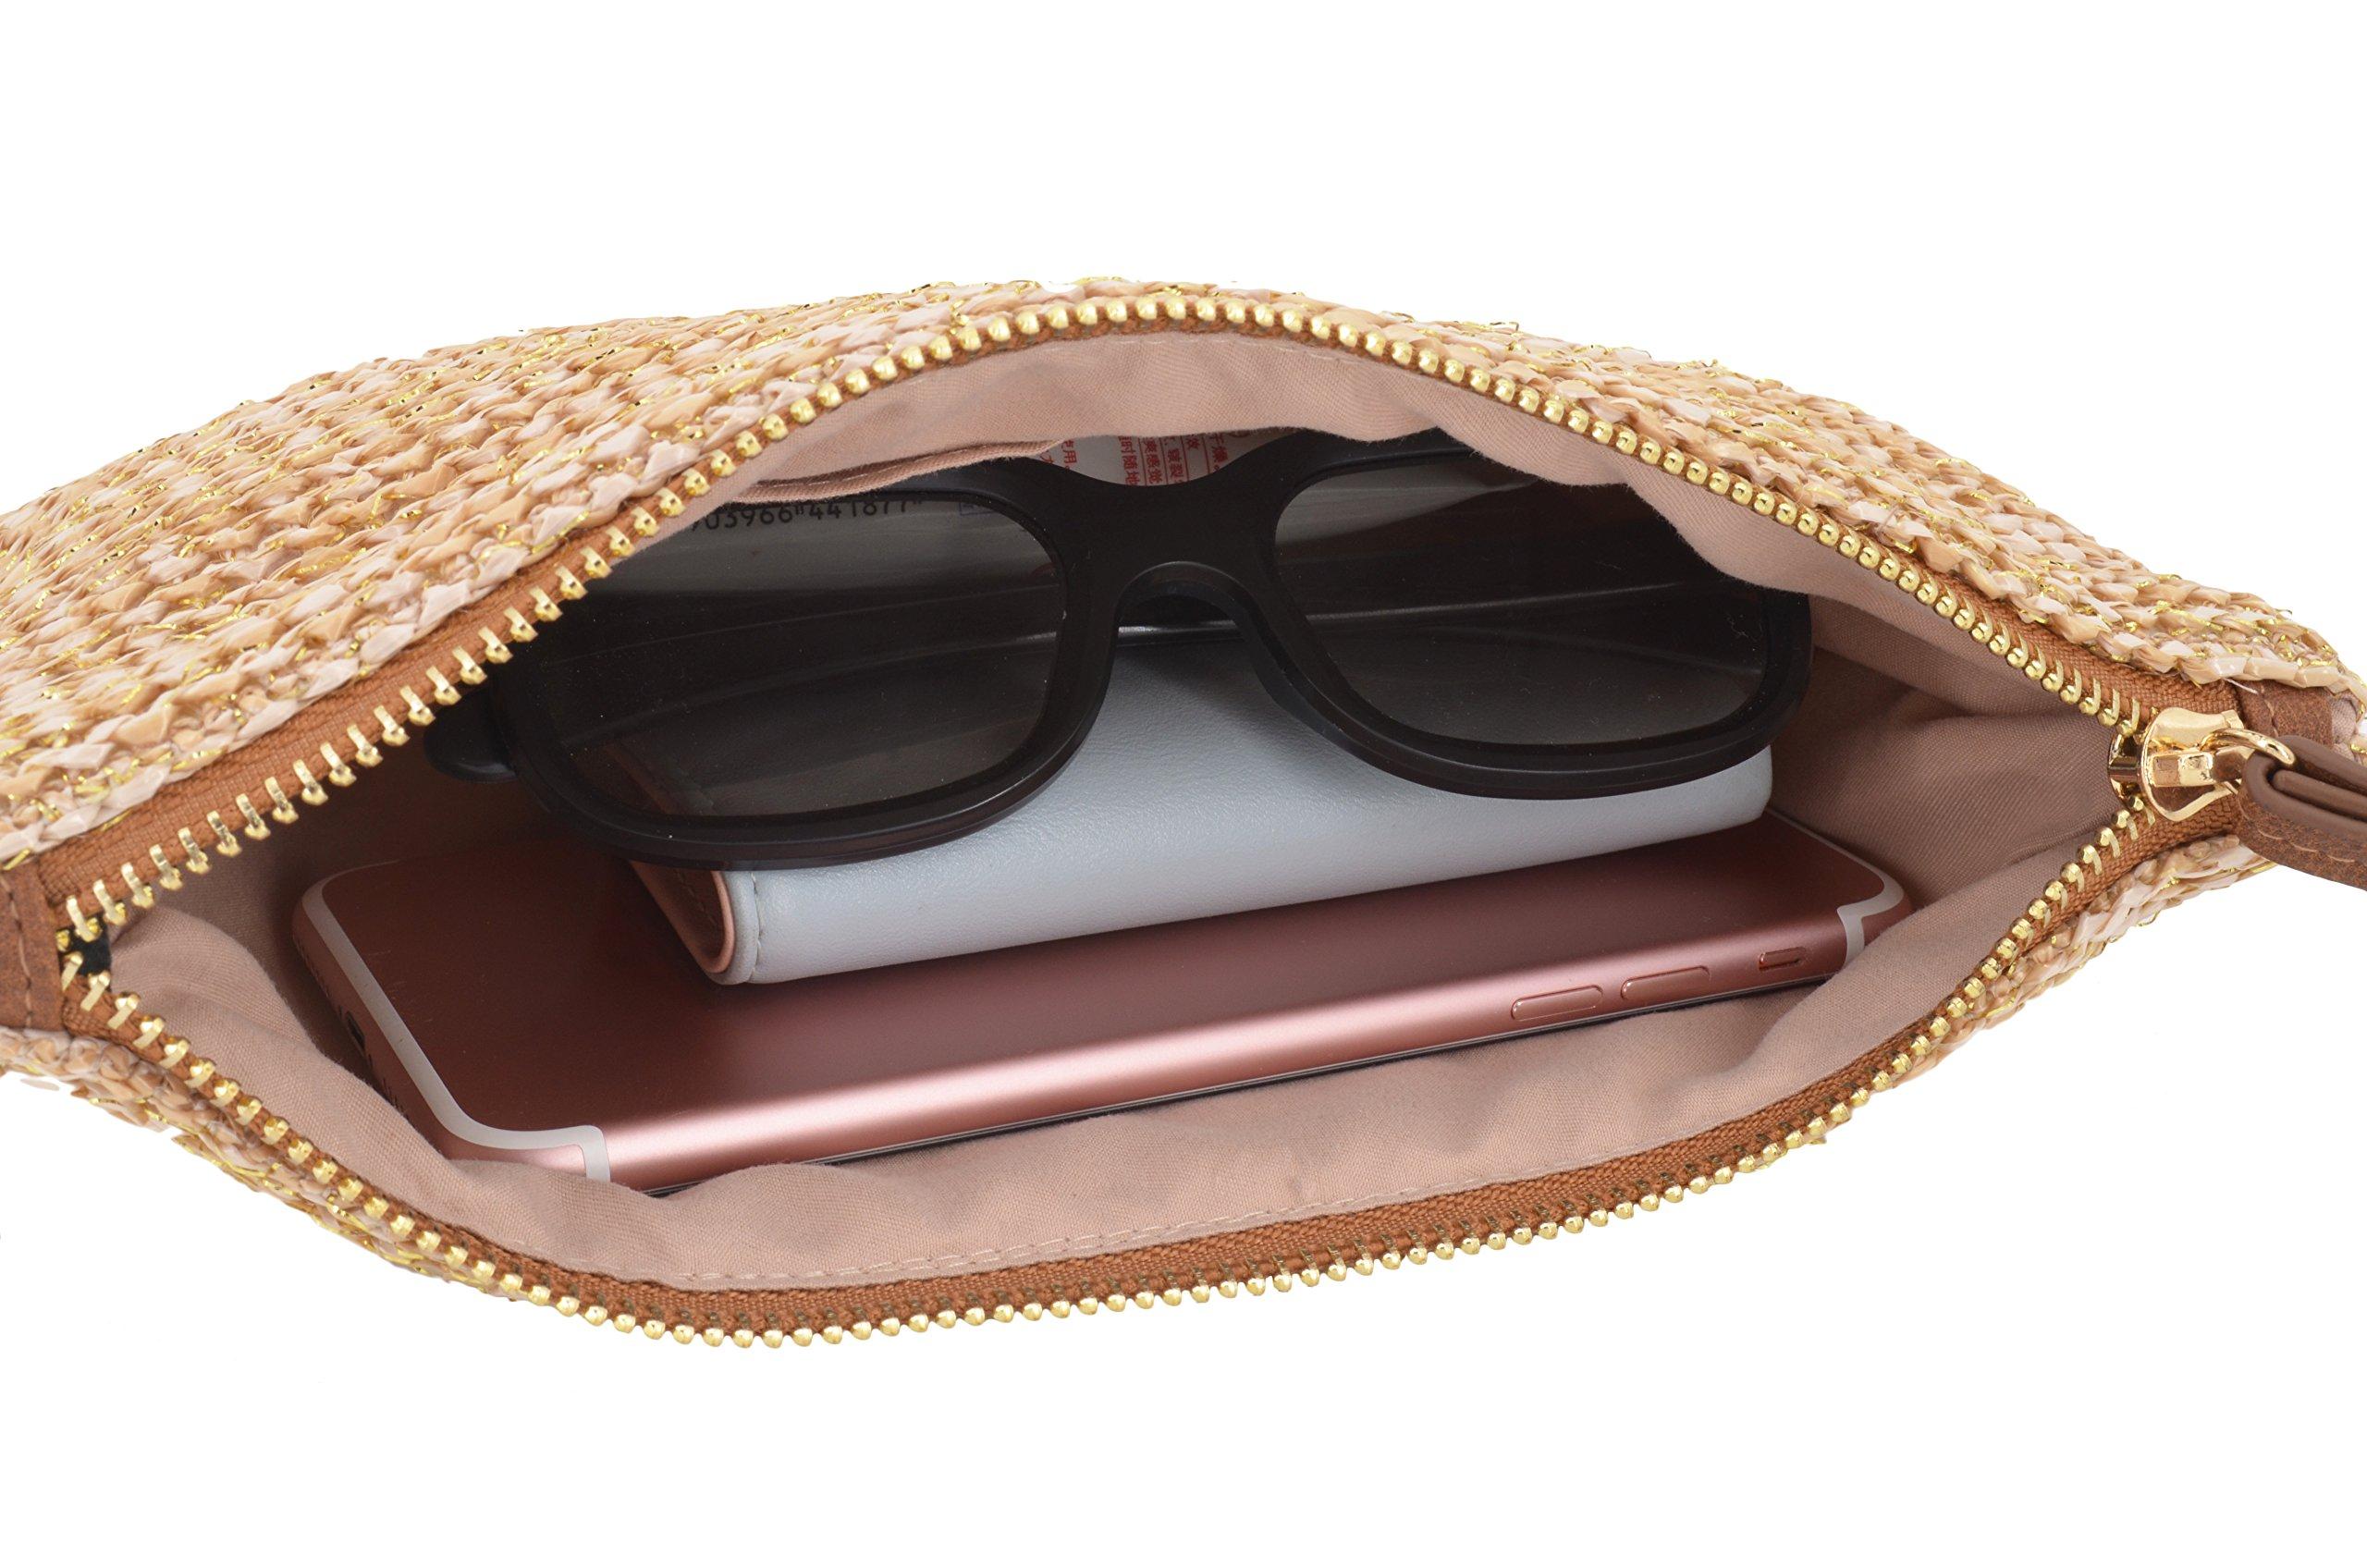 AGNETA Women's Hand Wrist Type Straw Clutch Summer Beach Sea Handbag (Brown Large) by AGNETA (Image #7)